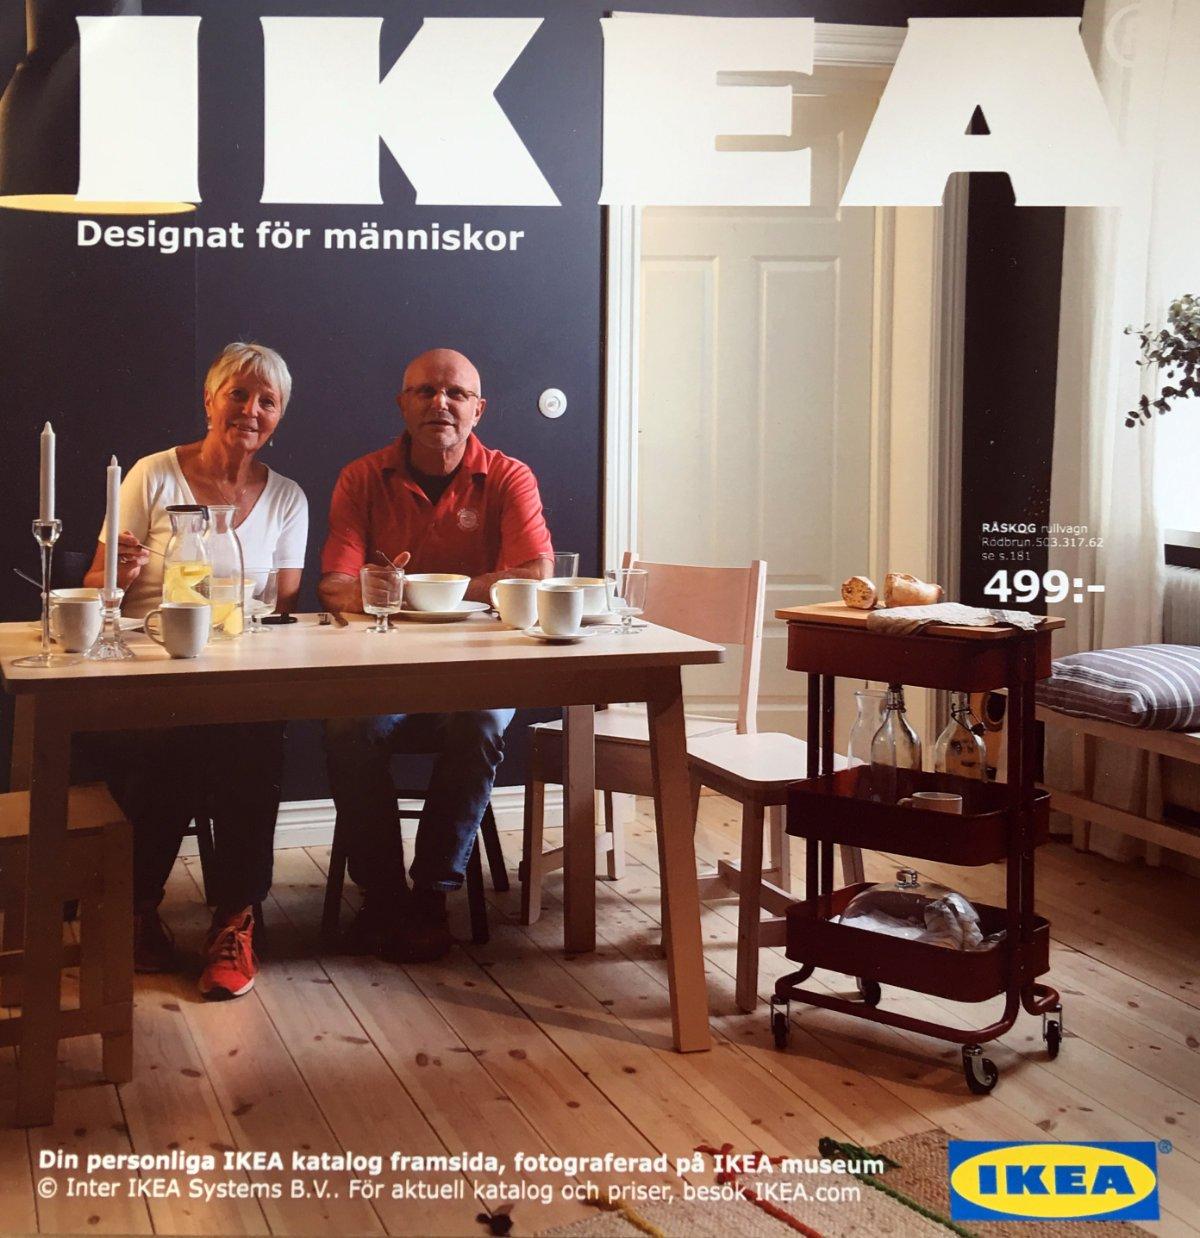 Wir auf dem IKEA Katalog-Titel